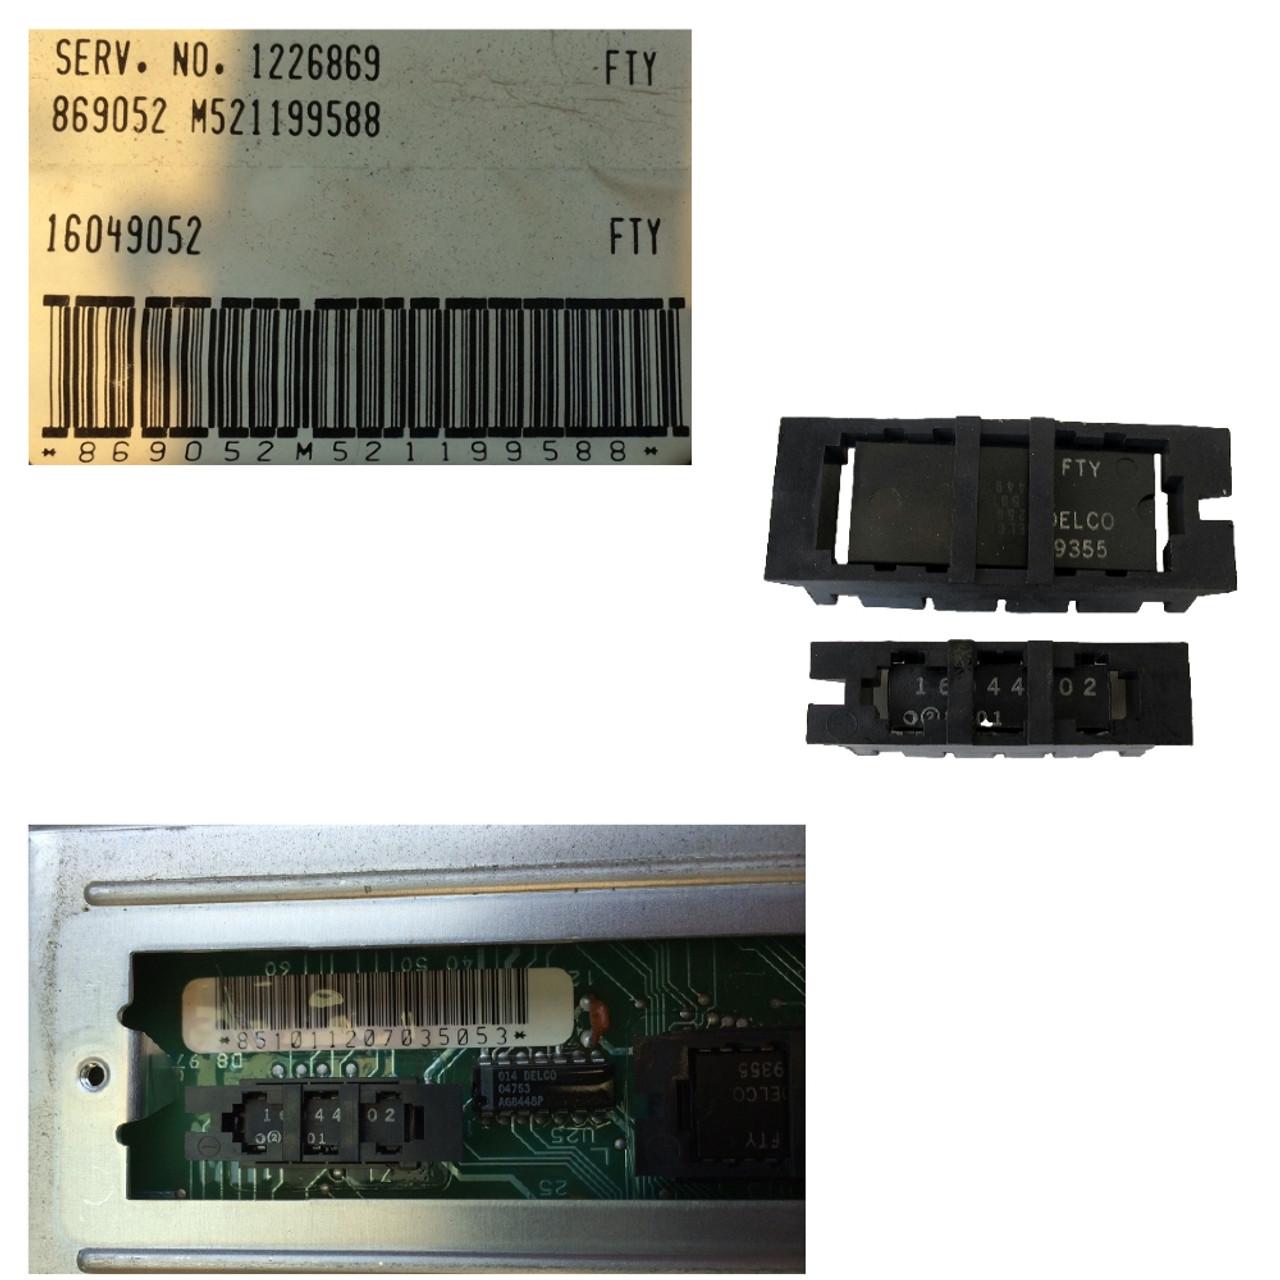 1985 Fiero V6, 4-SPD, ECM PROM and Calpak